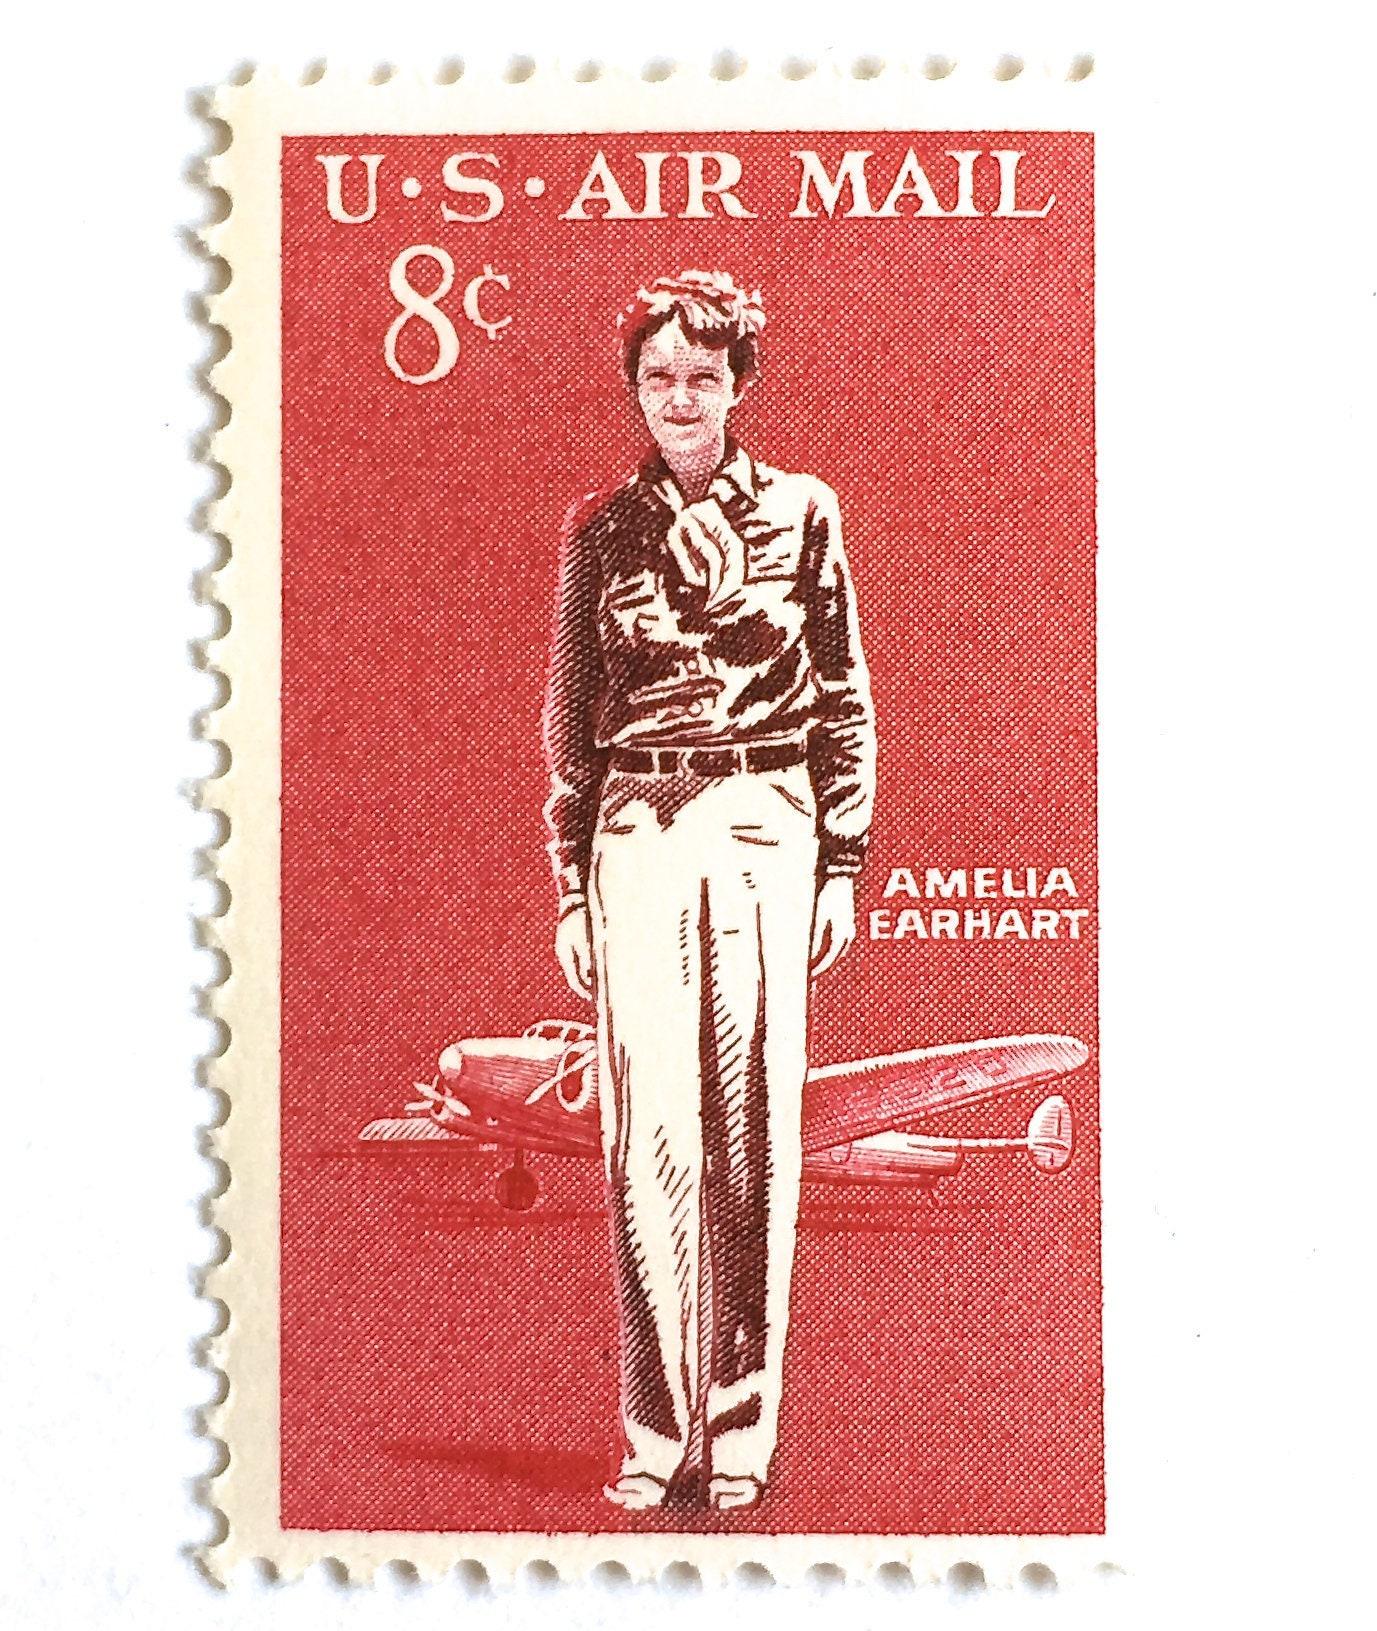 10 Vintage Amelia Earhart Postage Stamps // 8 Cent Vintage Red